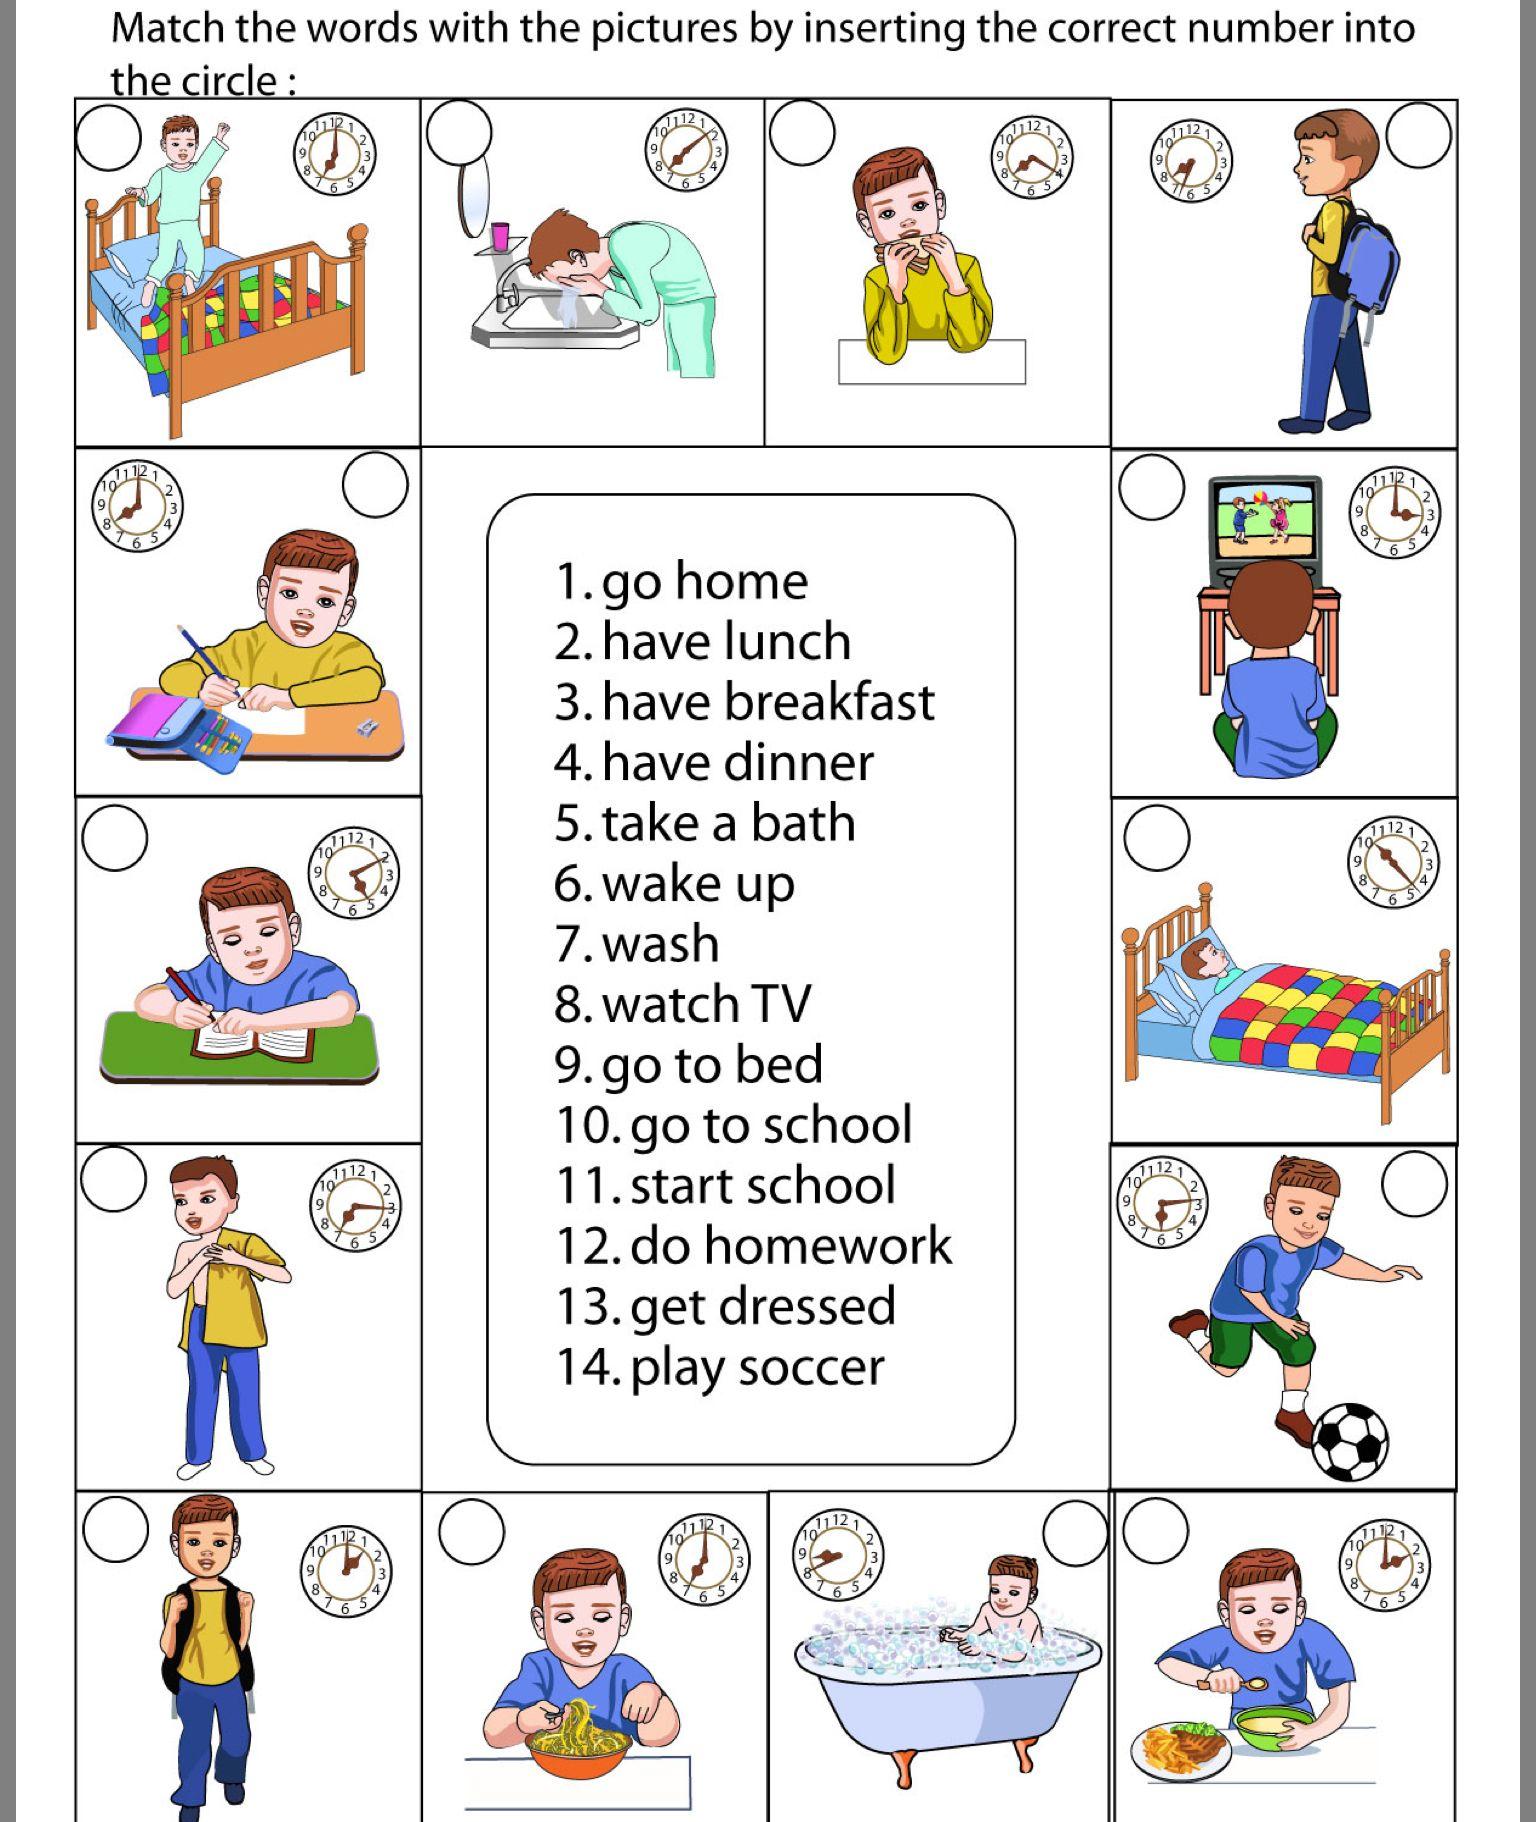 English Lessons Image By Zohour Melhem On Preschool